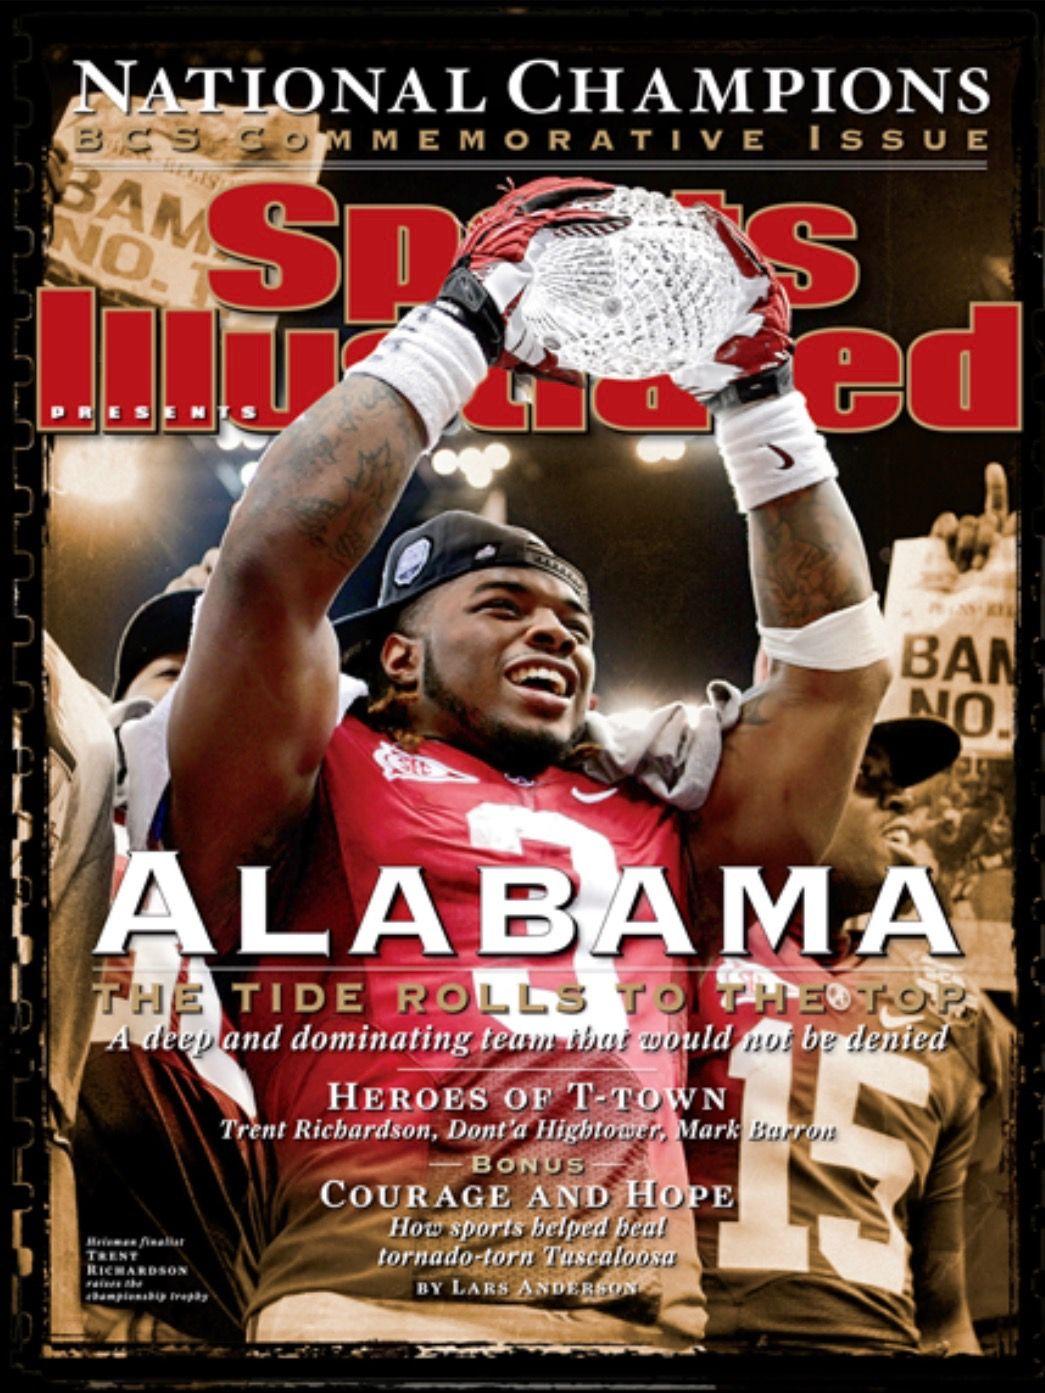 Alabama Crimson Tide (The Tide Rolls To The Top) January